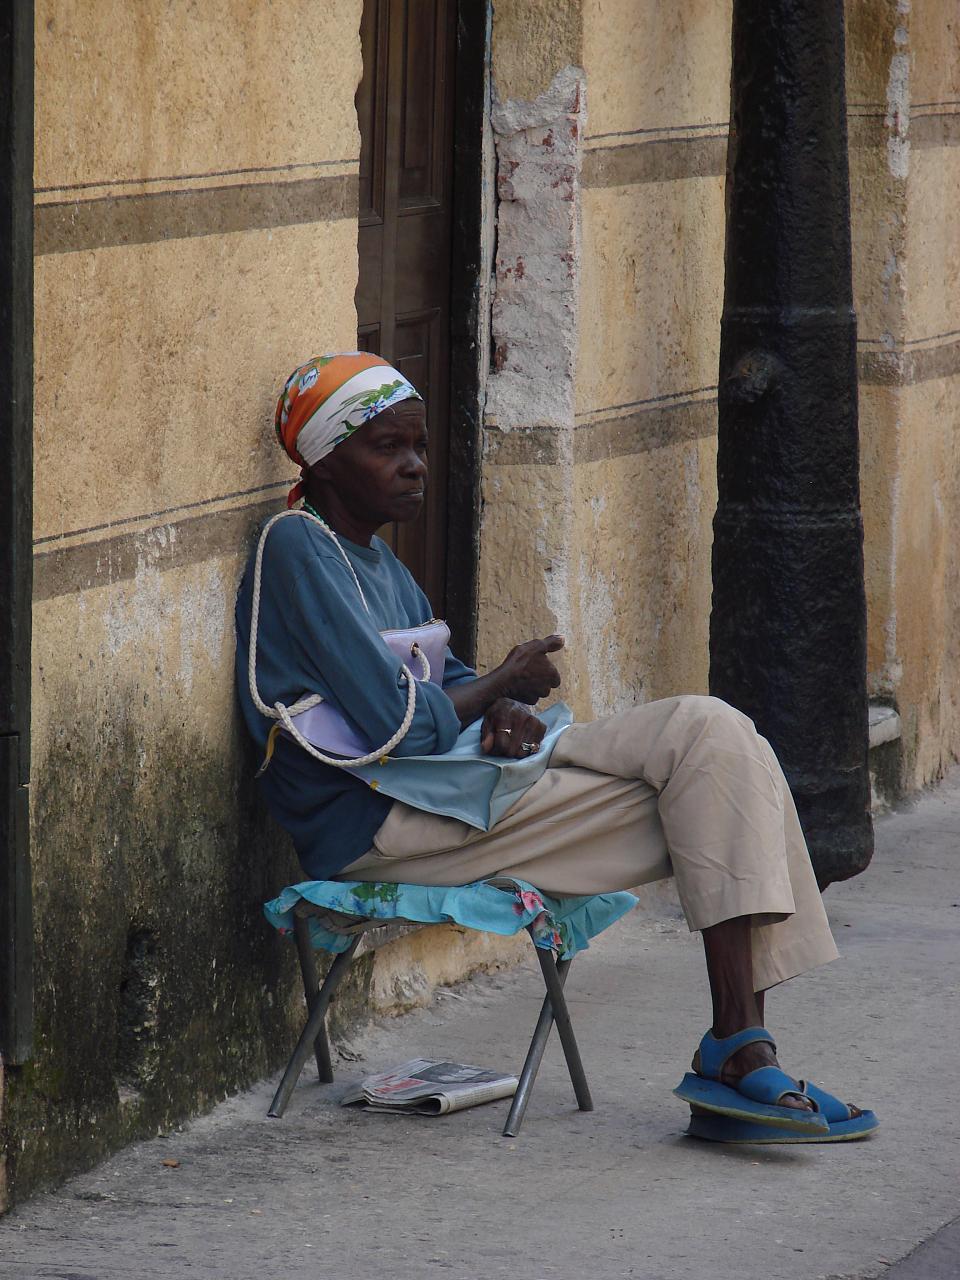 Cuba: fotos del acontecer diario - Página 6 3291954311_7f7045bd5d_o